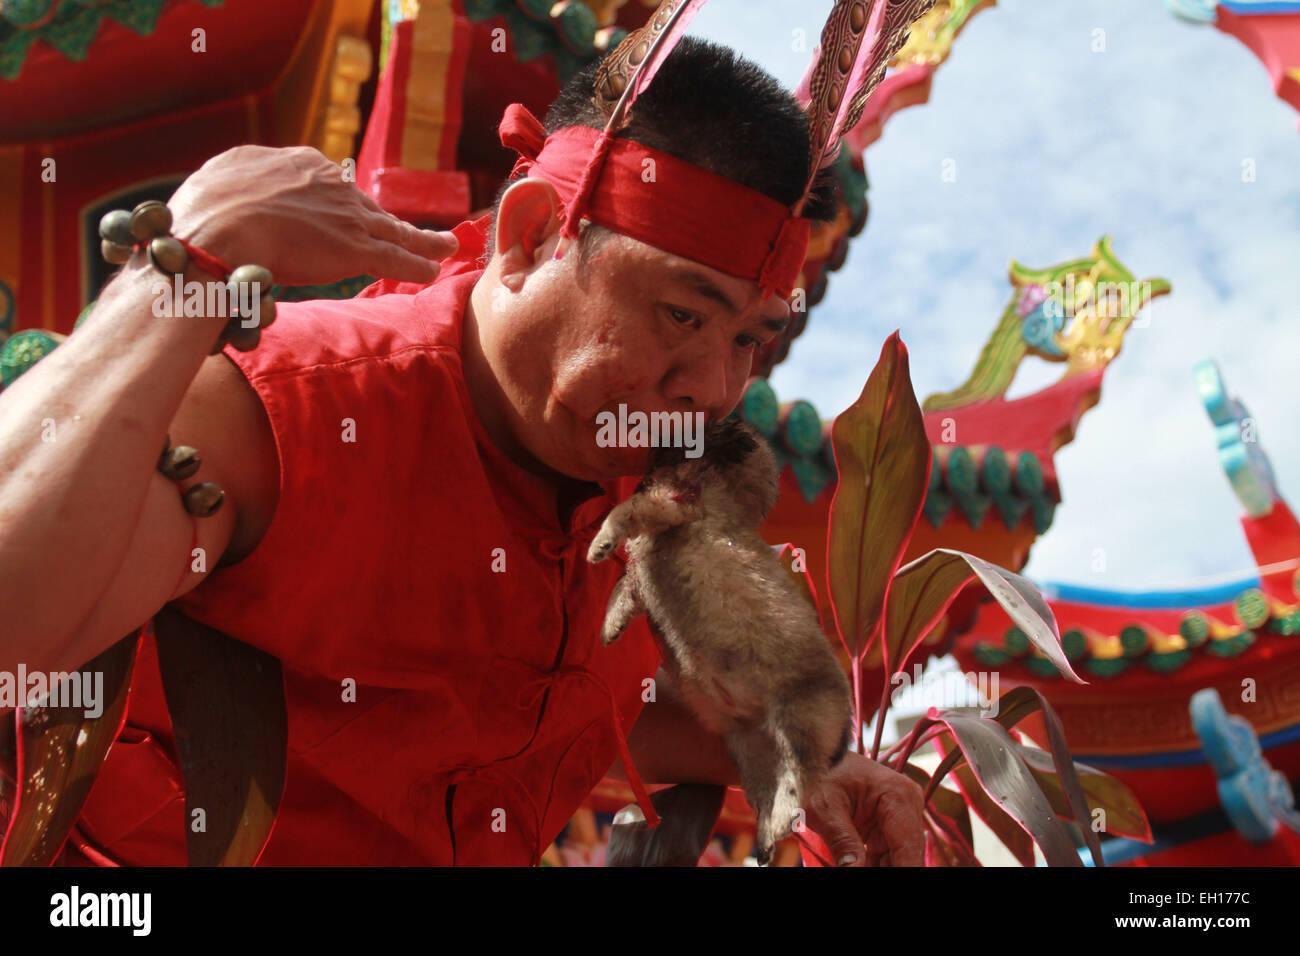 Singkawang, Kalimantan Occidental, Indonesia. 4 Mar, 2015. En Kalimantan Occidental, Indonesia - Marzo 04: Tatung Imagen De Stock